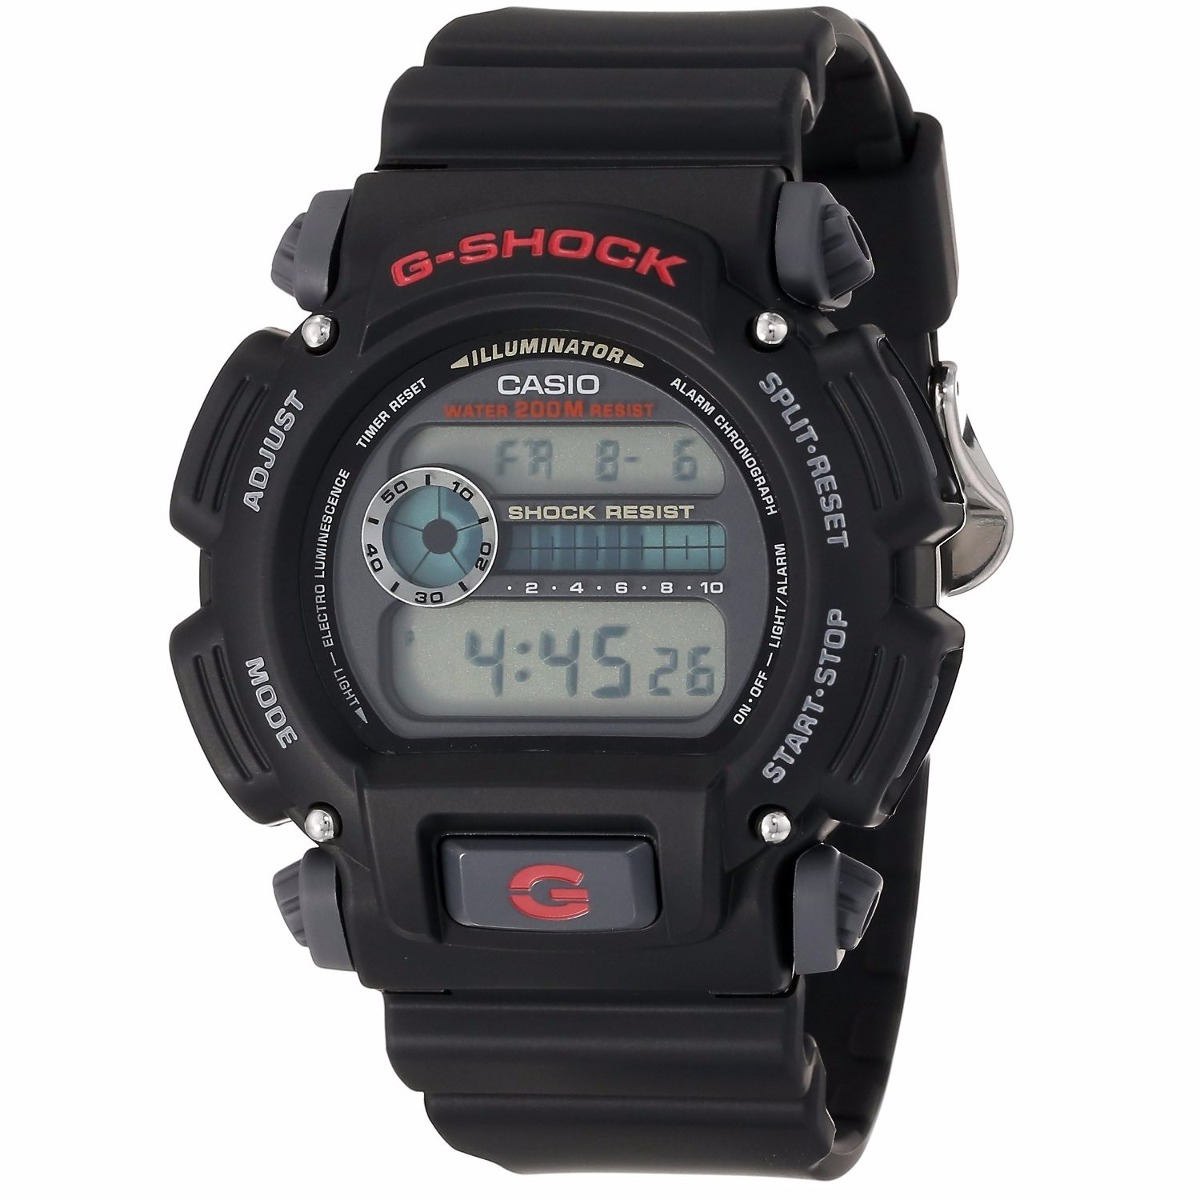 283b099a6db relógio masculino casio g-shock dw-9052-1vdr - nota fiscal. Carregando zoom.